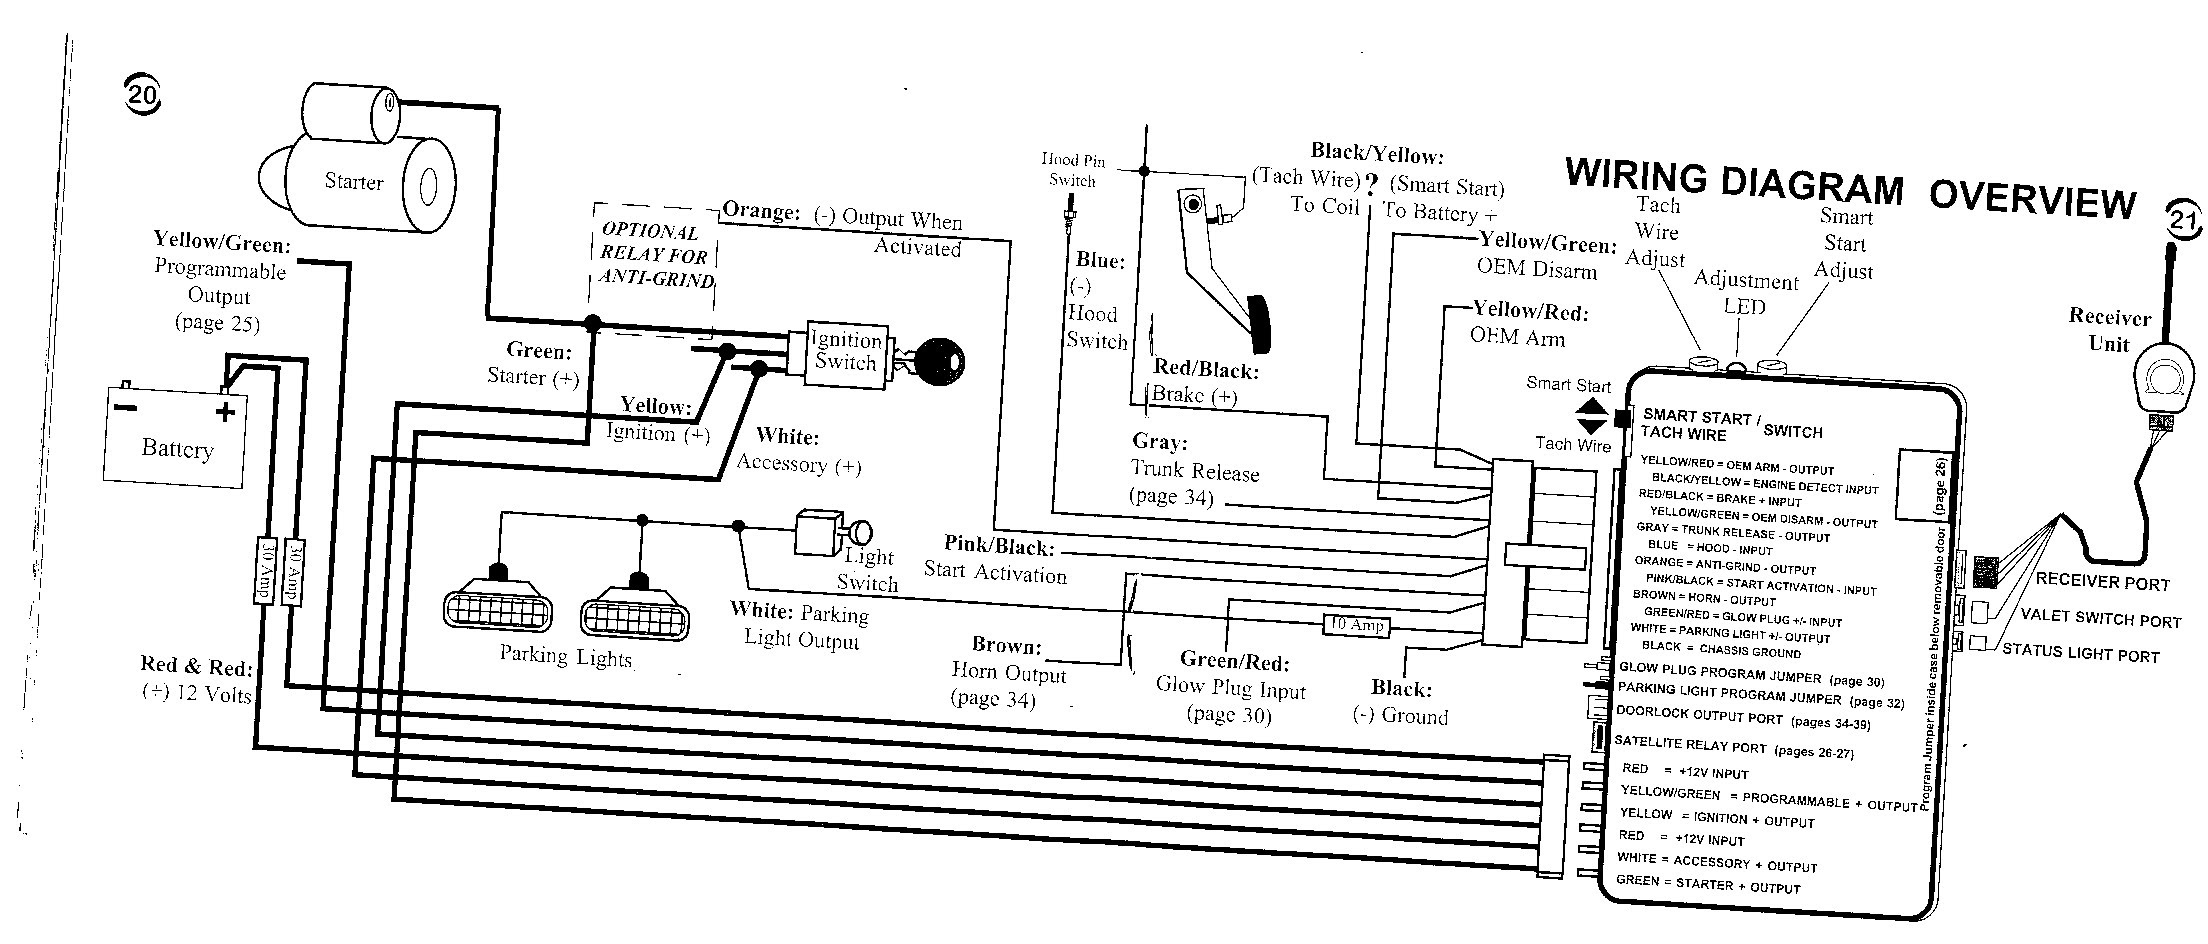 Dodge Viper Wiring Diagrams Wiring Diagram Camaro A Camaro A Graniantichiumbri It